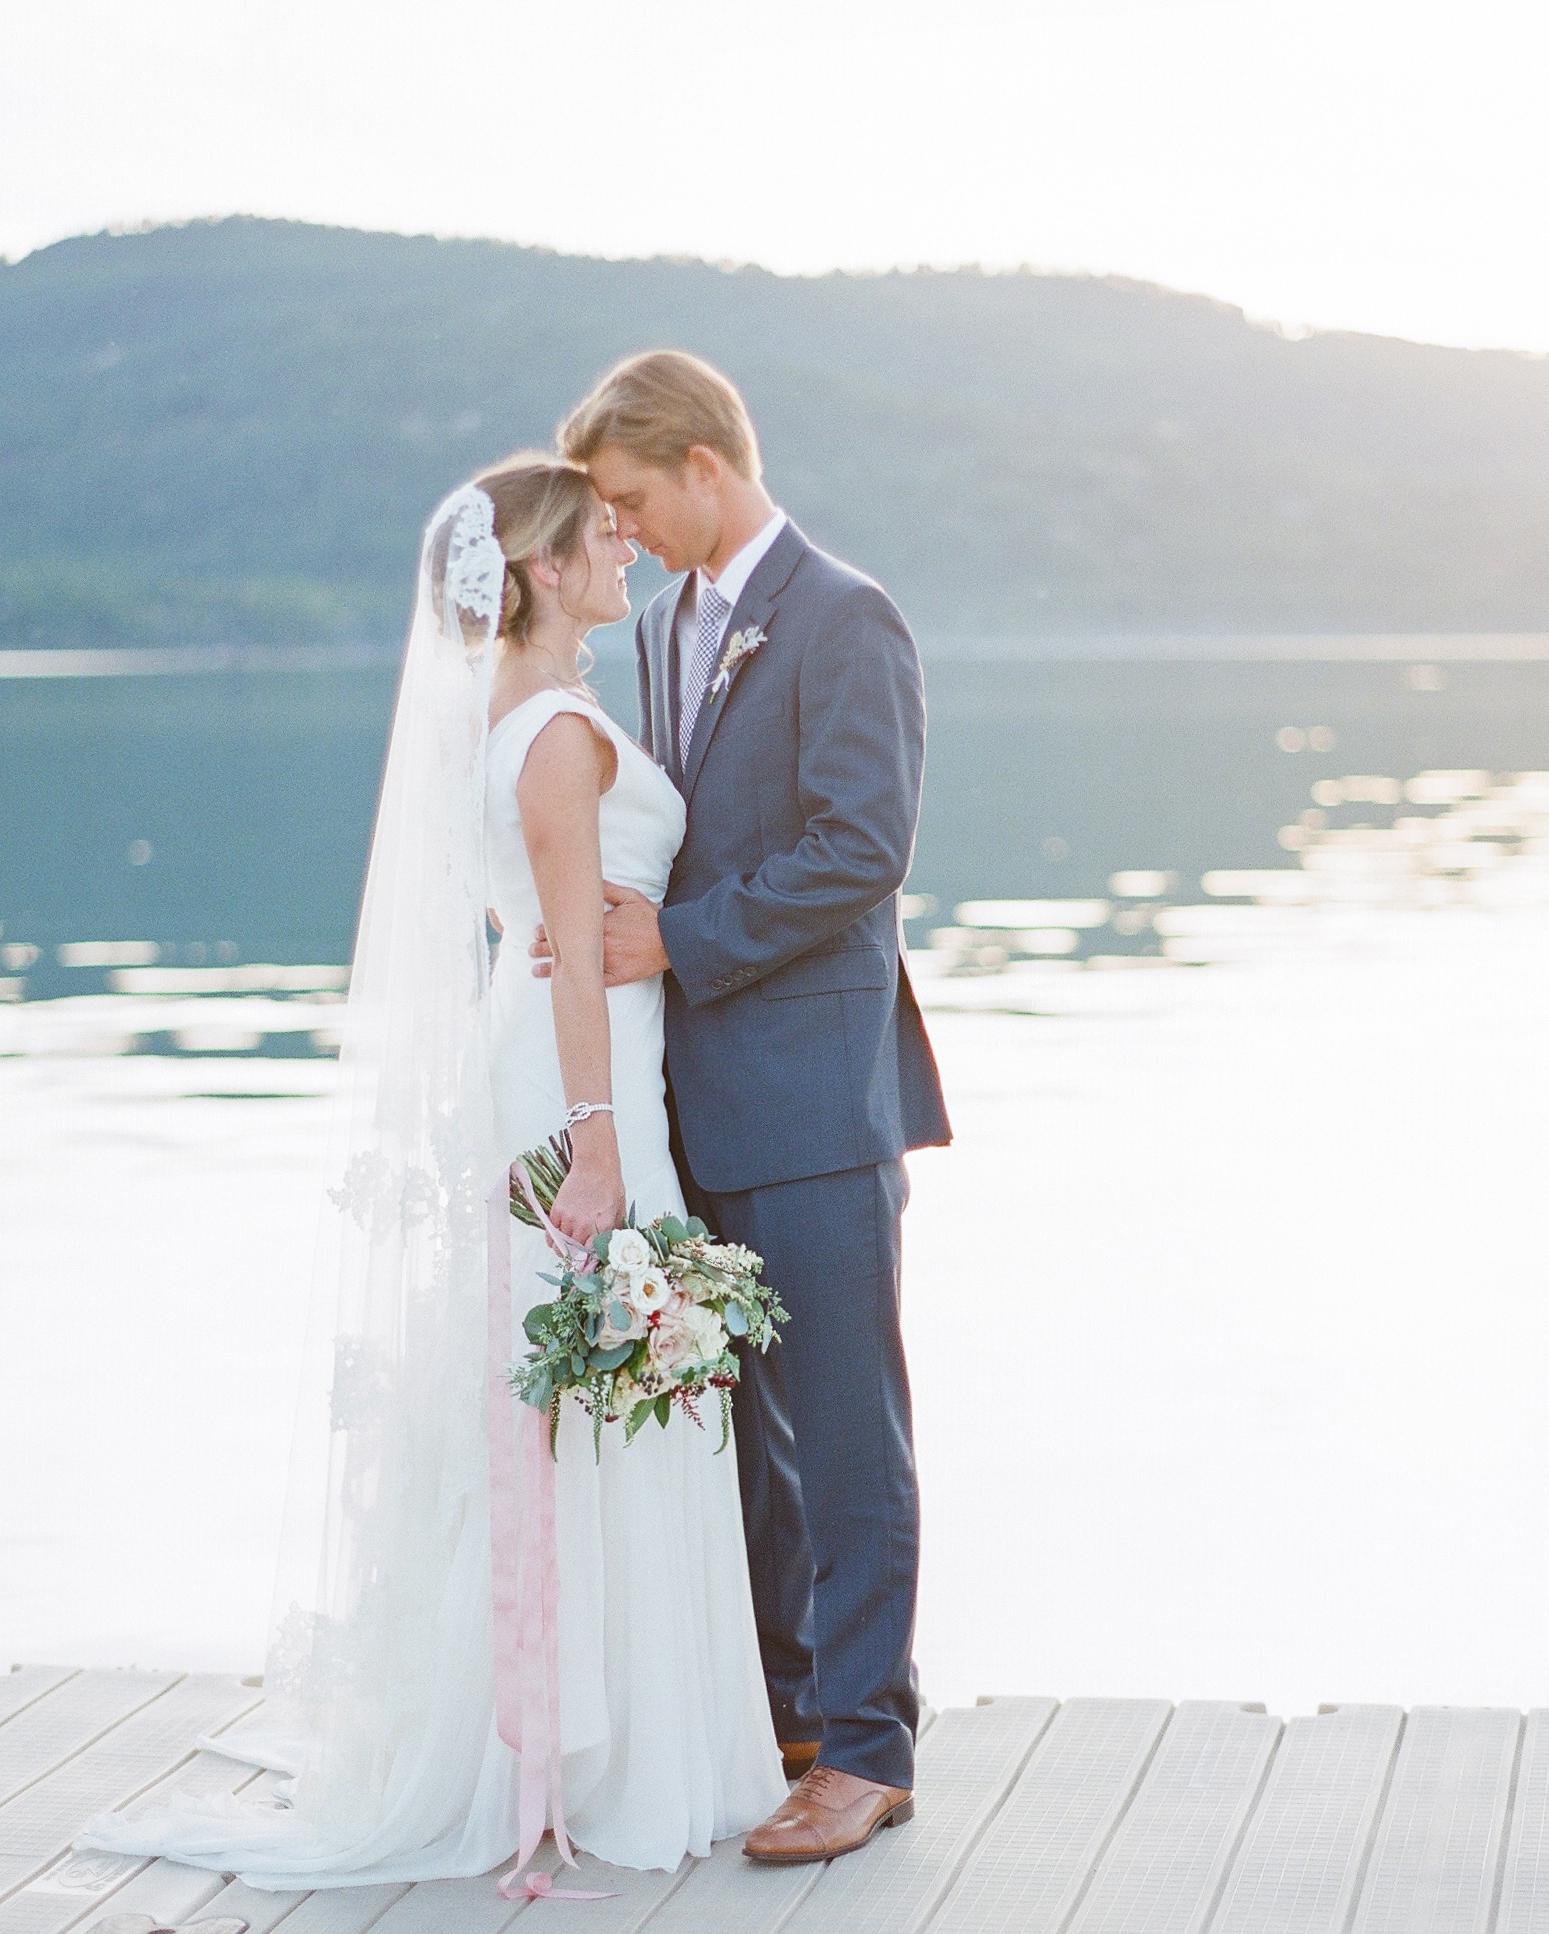 robin-kenny-wedding-couple-090-s112068-0715.jpg